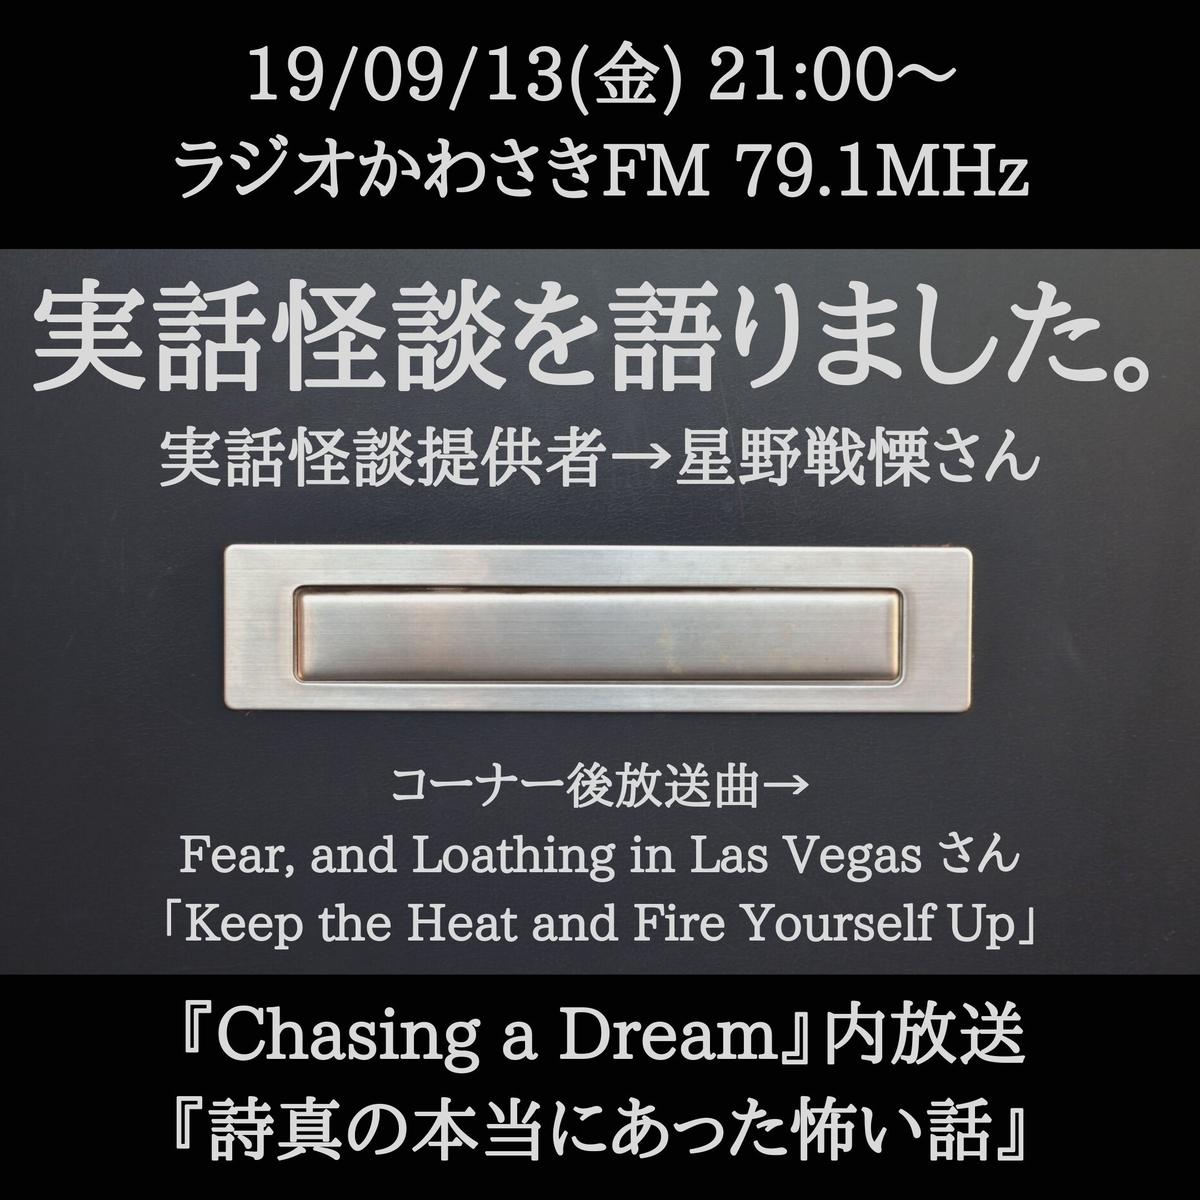 f:id:yukaitekietsu:20190920160549j:plain